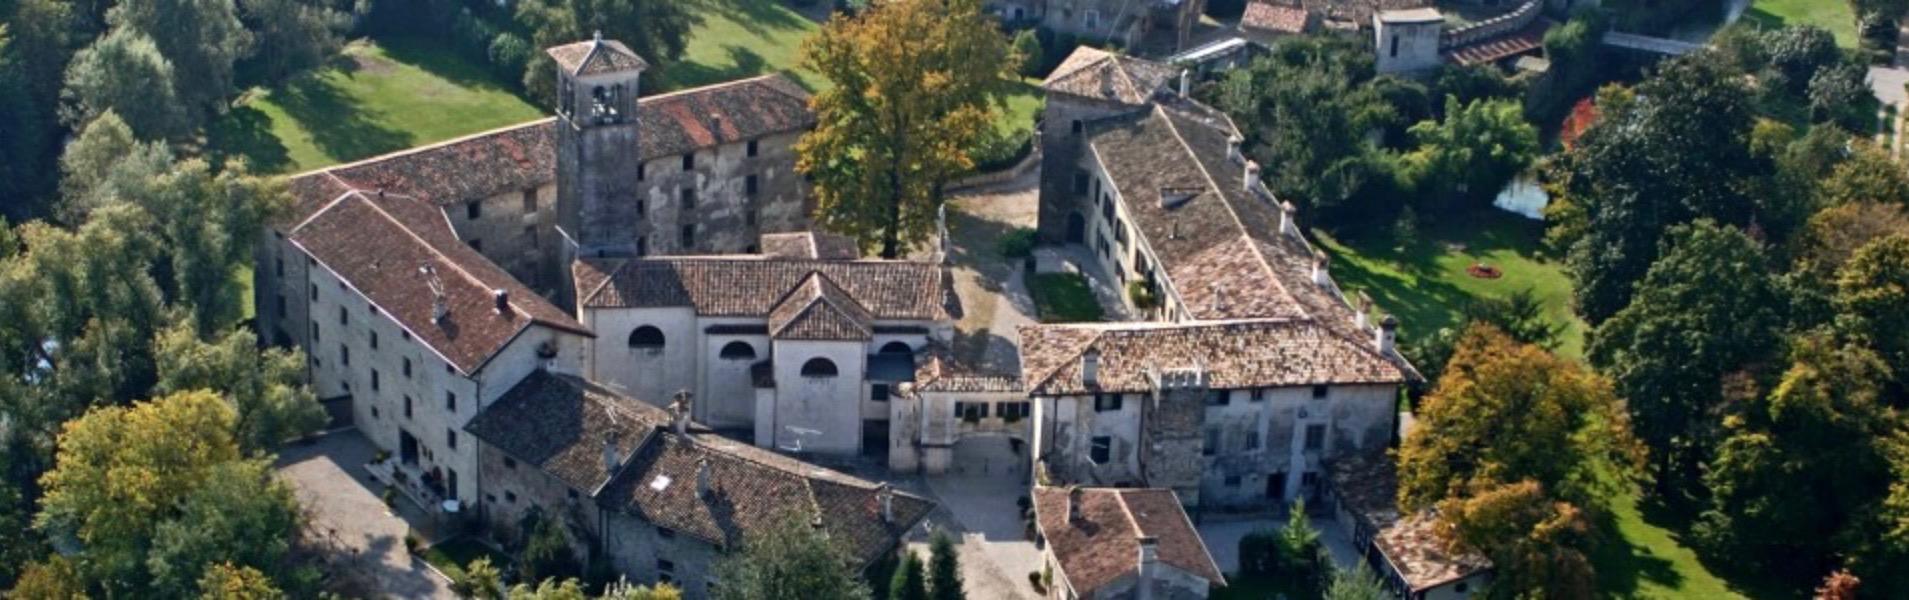 Castello Strassoldo